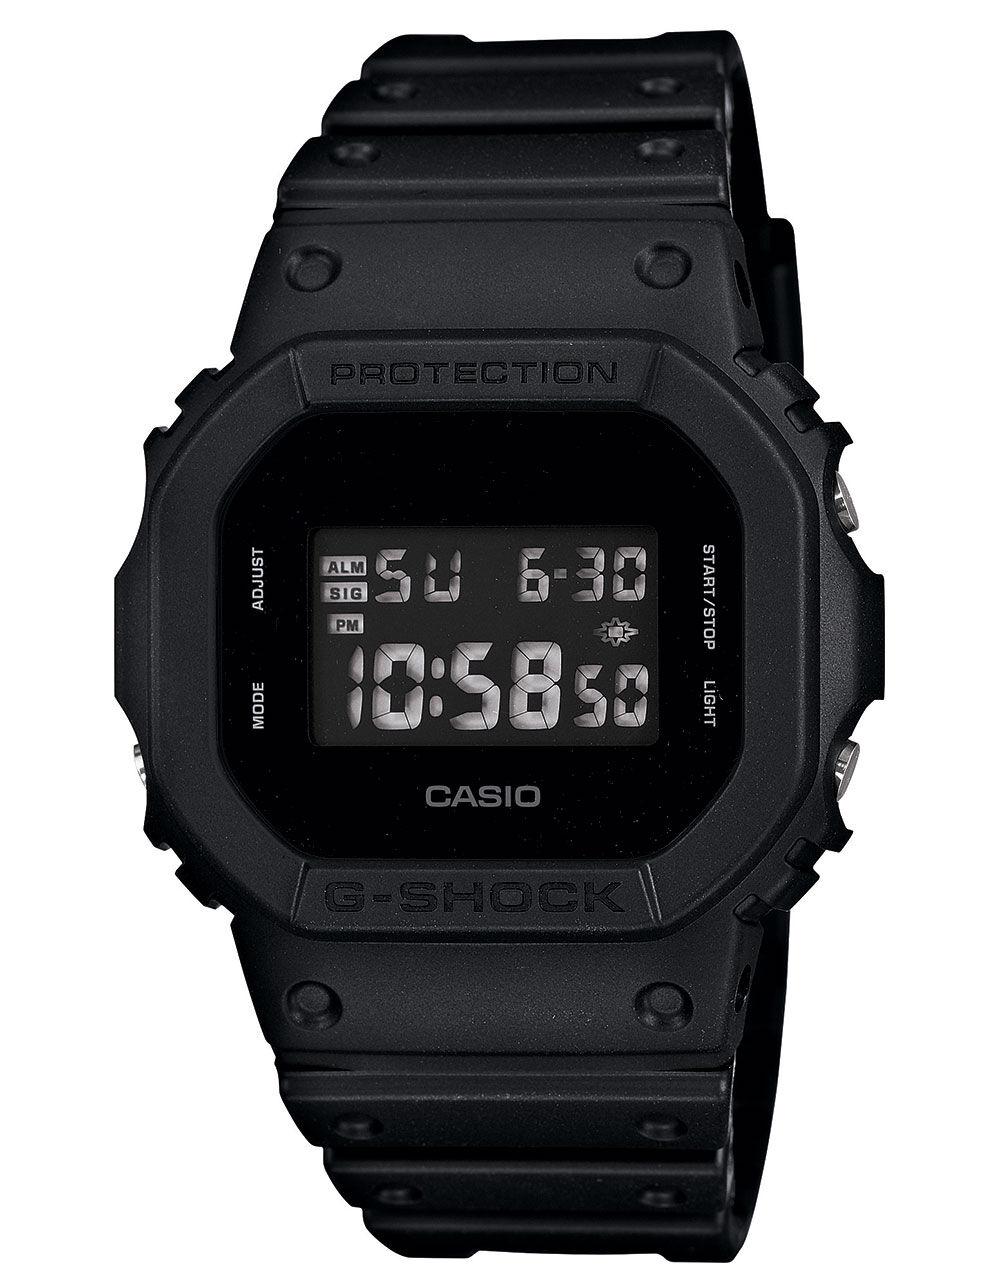 G-SHOCK DW-5600BB-1CR Watch